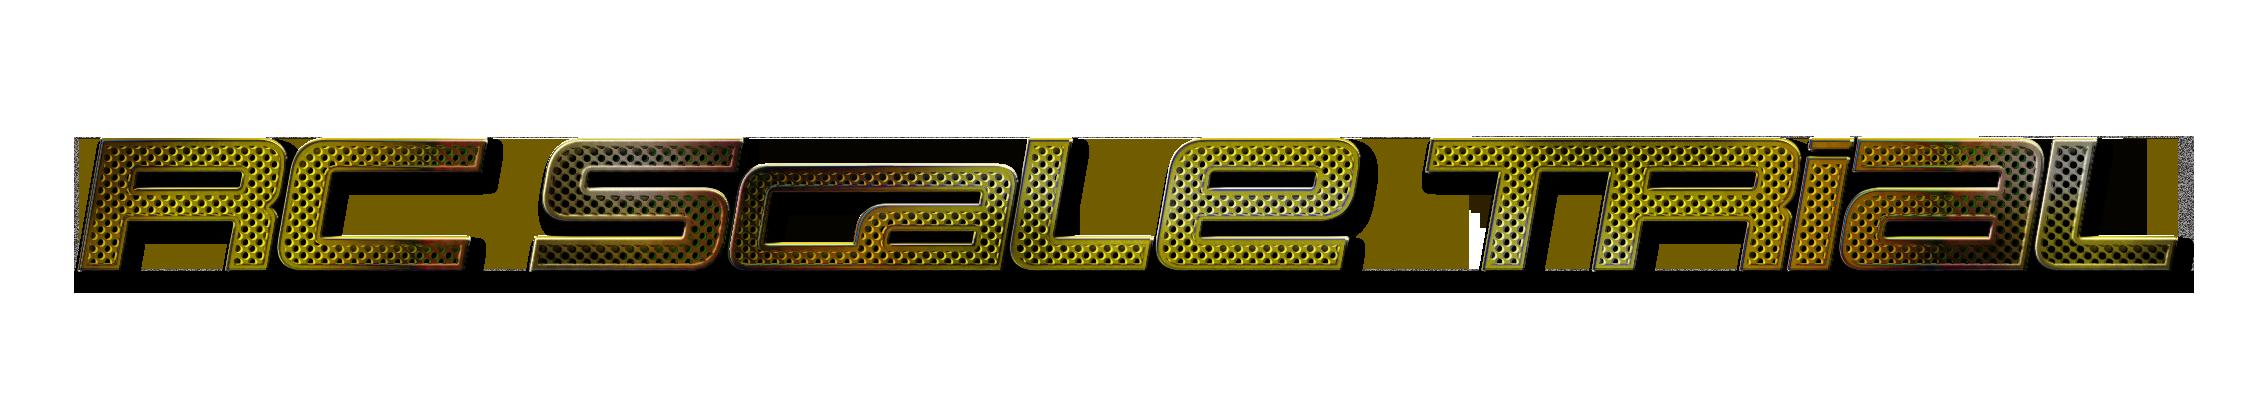 Logo du fofo 938227Logorcscaletrial